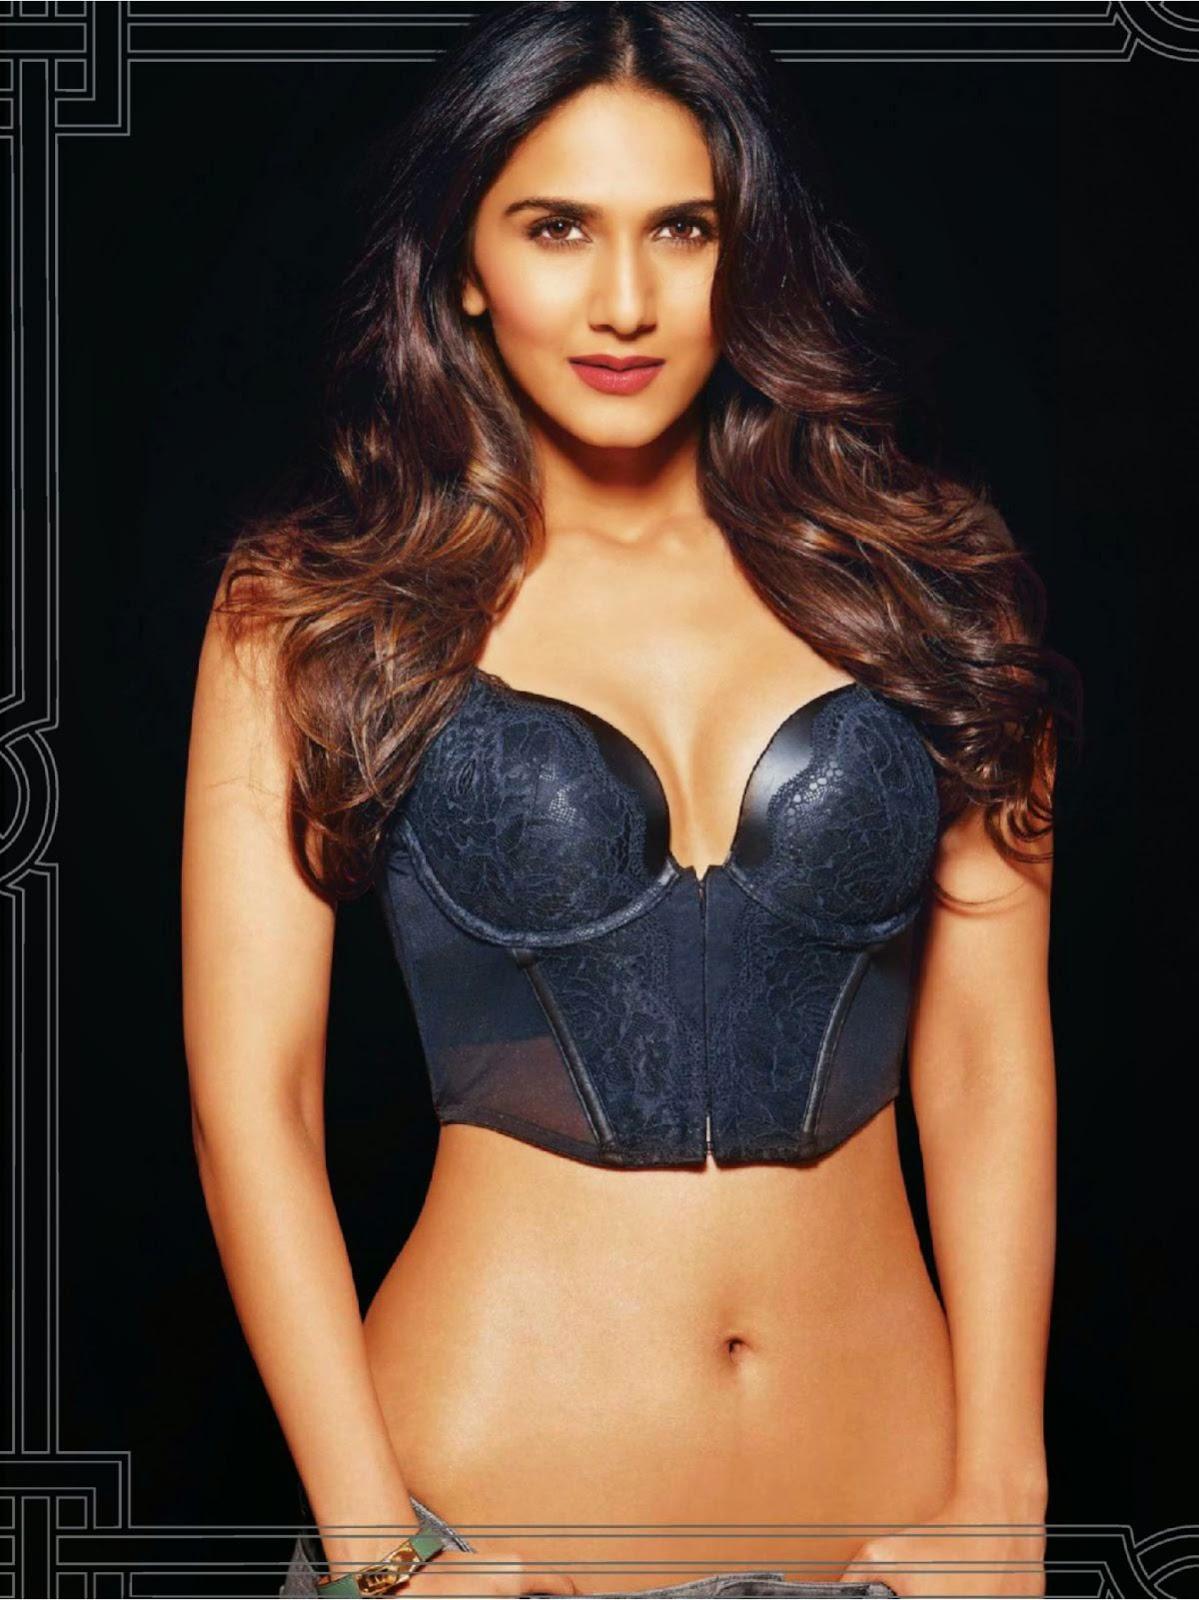 Vaani Kapoor navel and bra